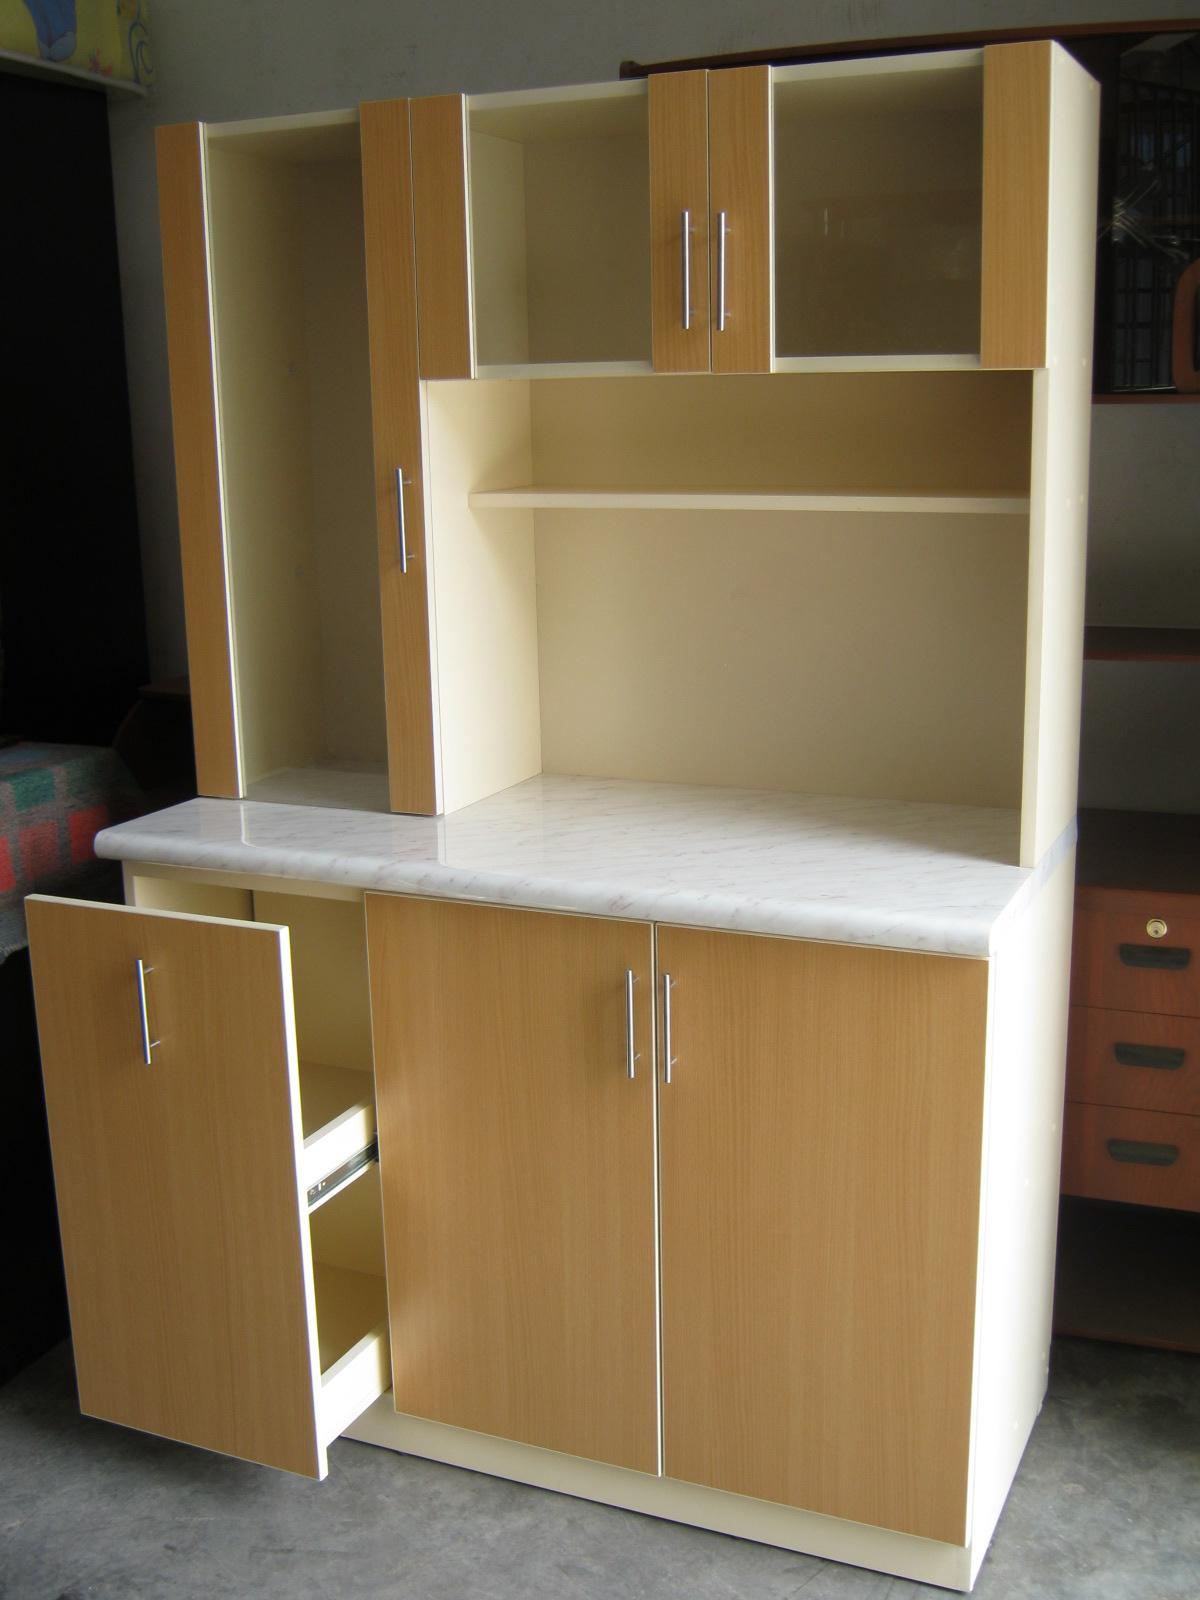 Mueble De Cocina En Sodimac : Dise?os jomar cocinas